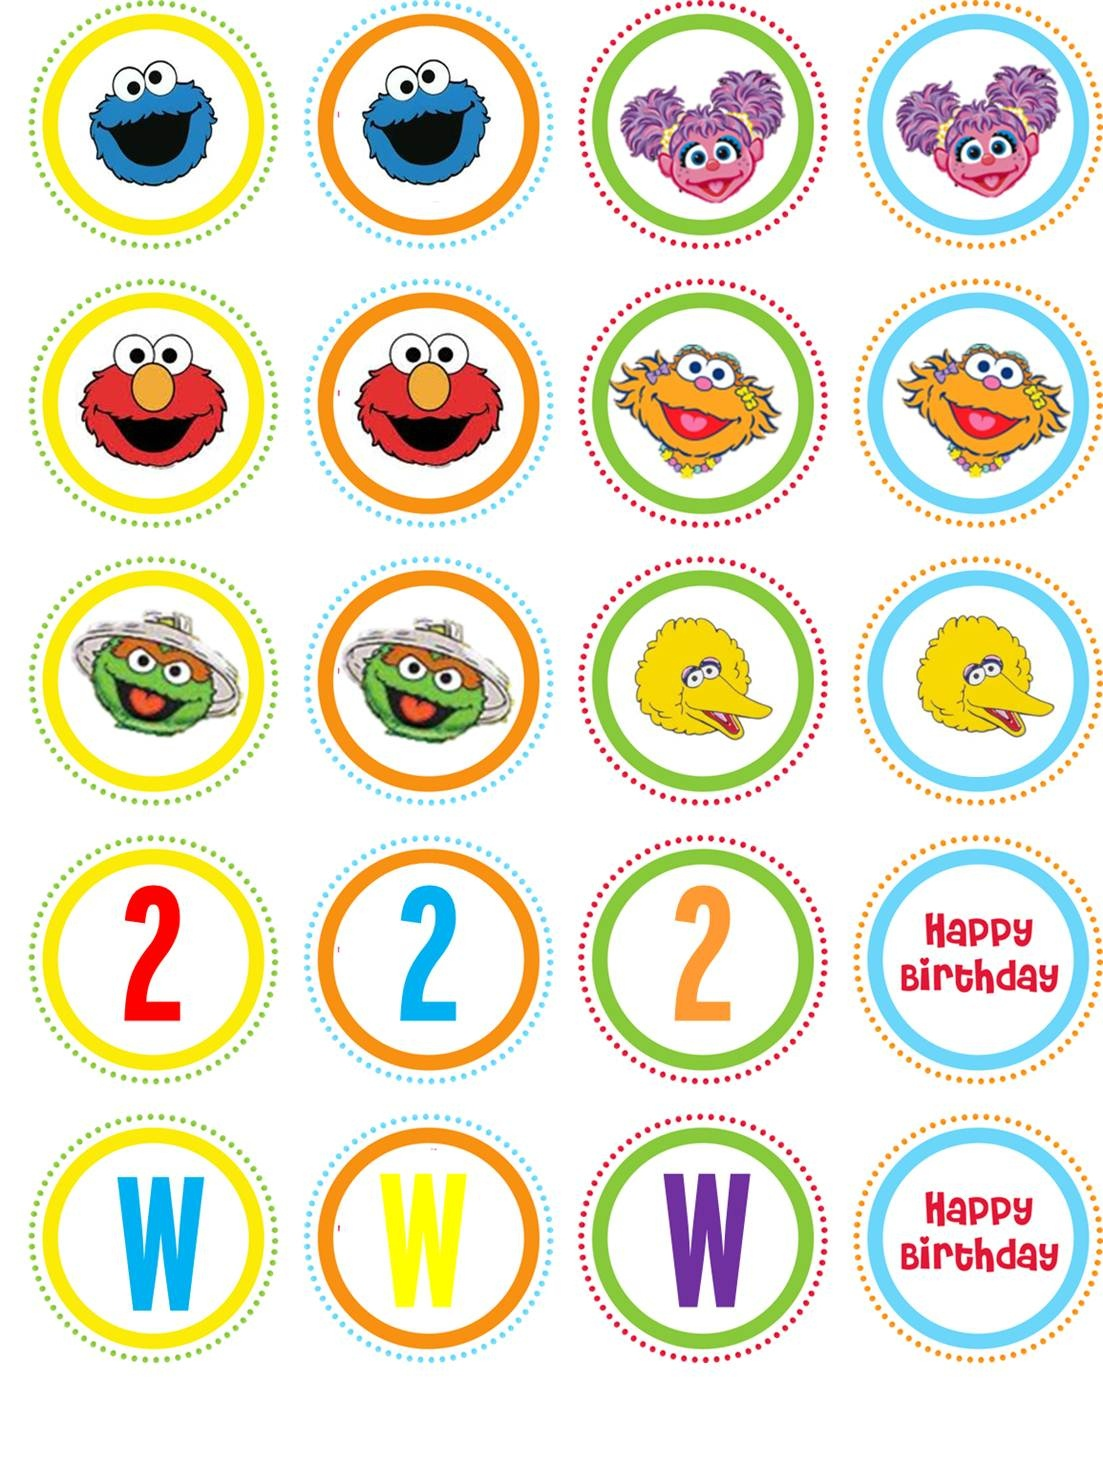 Pinjennifer Mercado On Sesame St | Pinterest - Free Printable Sesame Street Cupcake Toppers